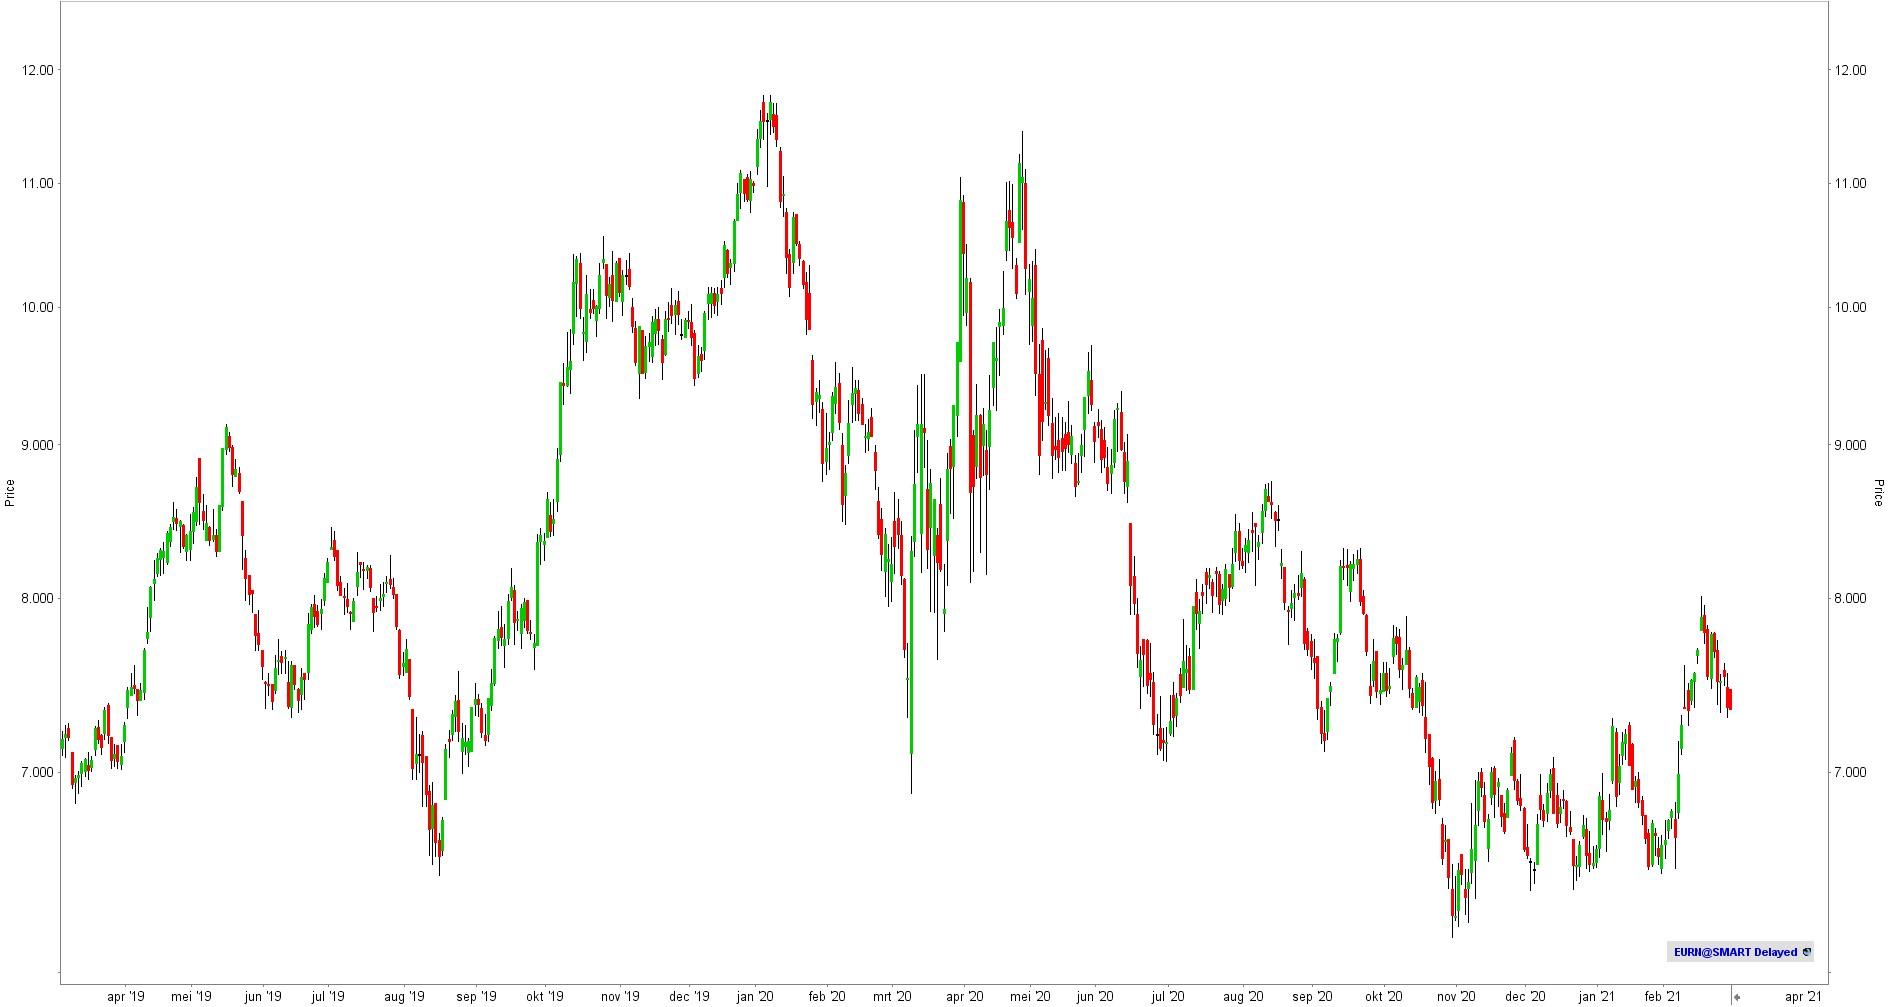 Koers aandeel euronav